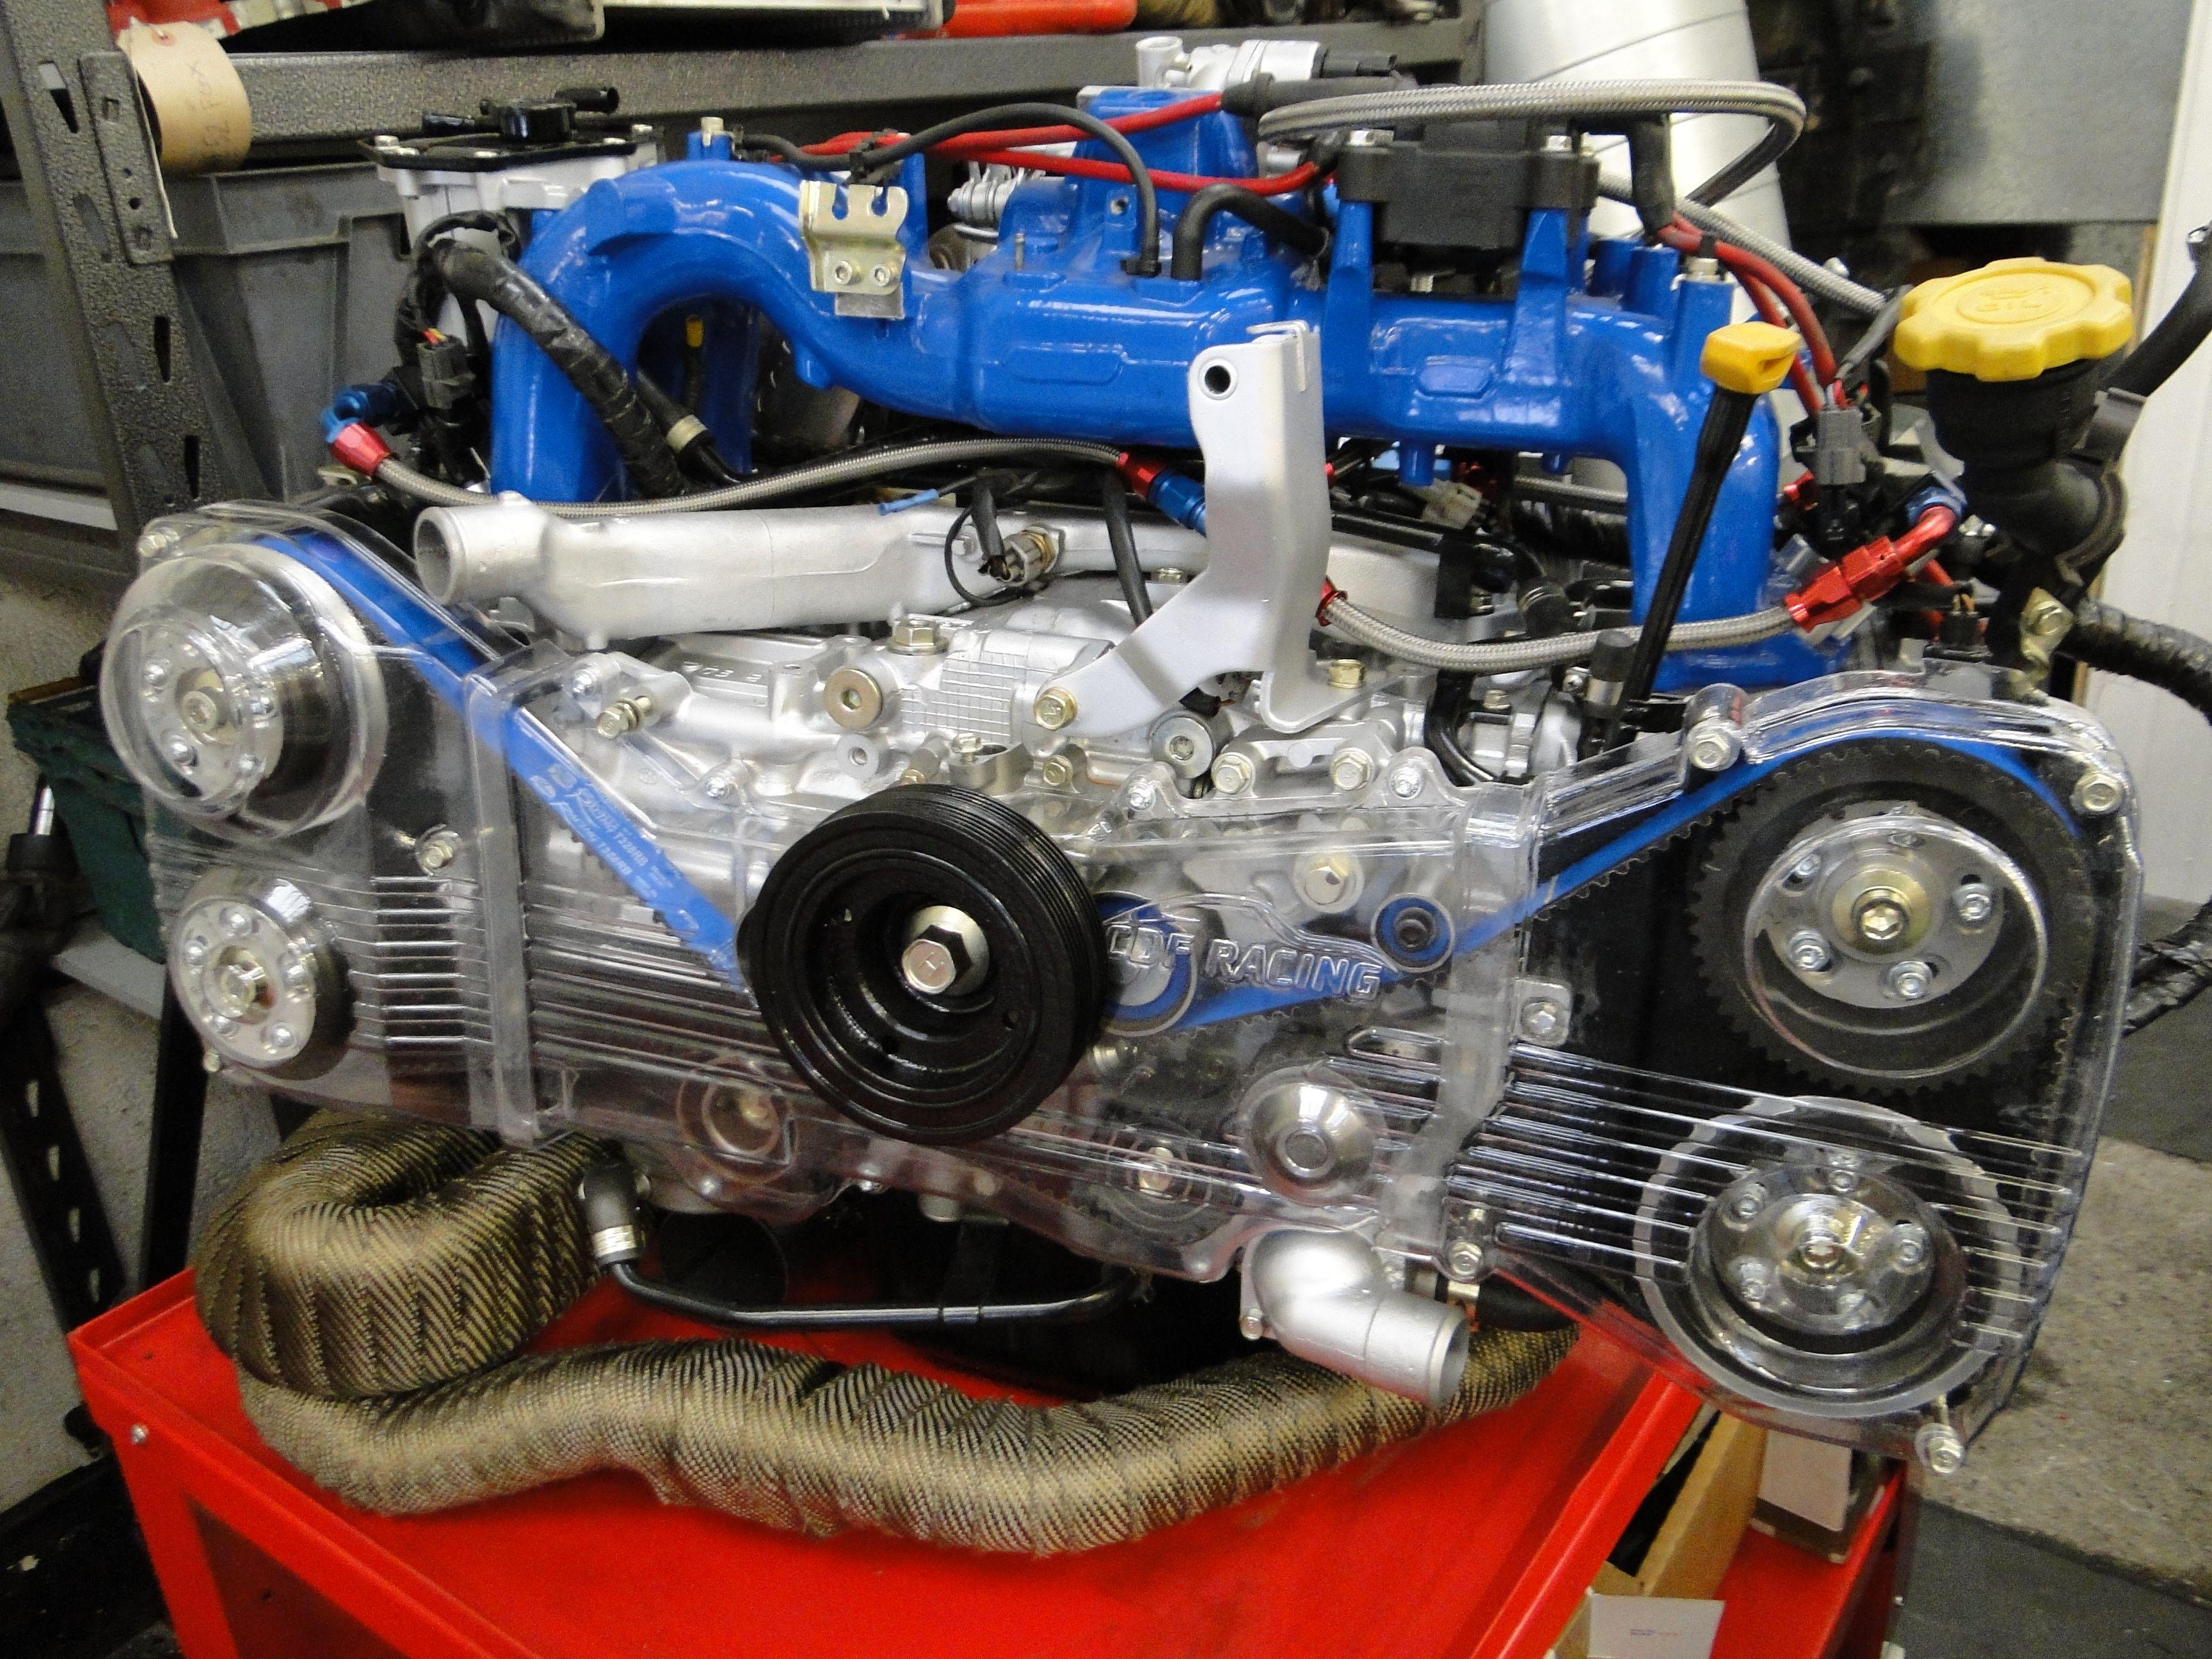 ej20/ej257 3 piece clear cam covers | AWD | Subaru cars, Subaru